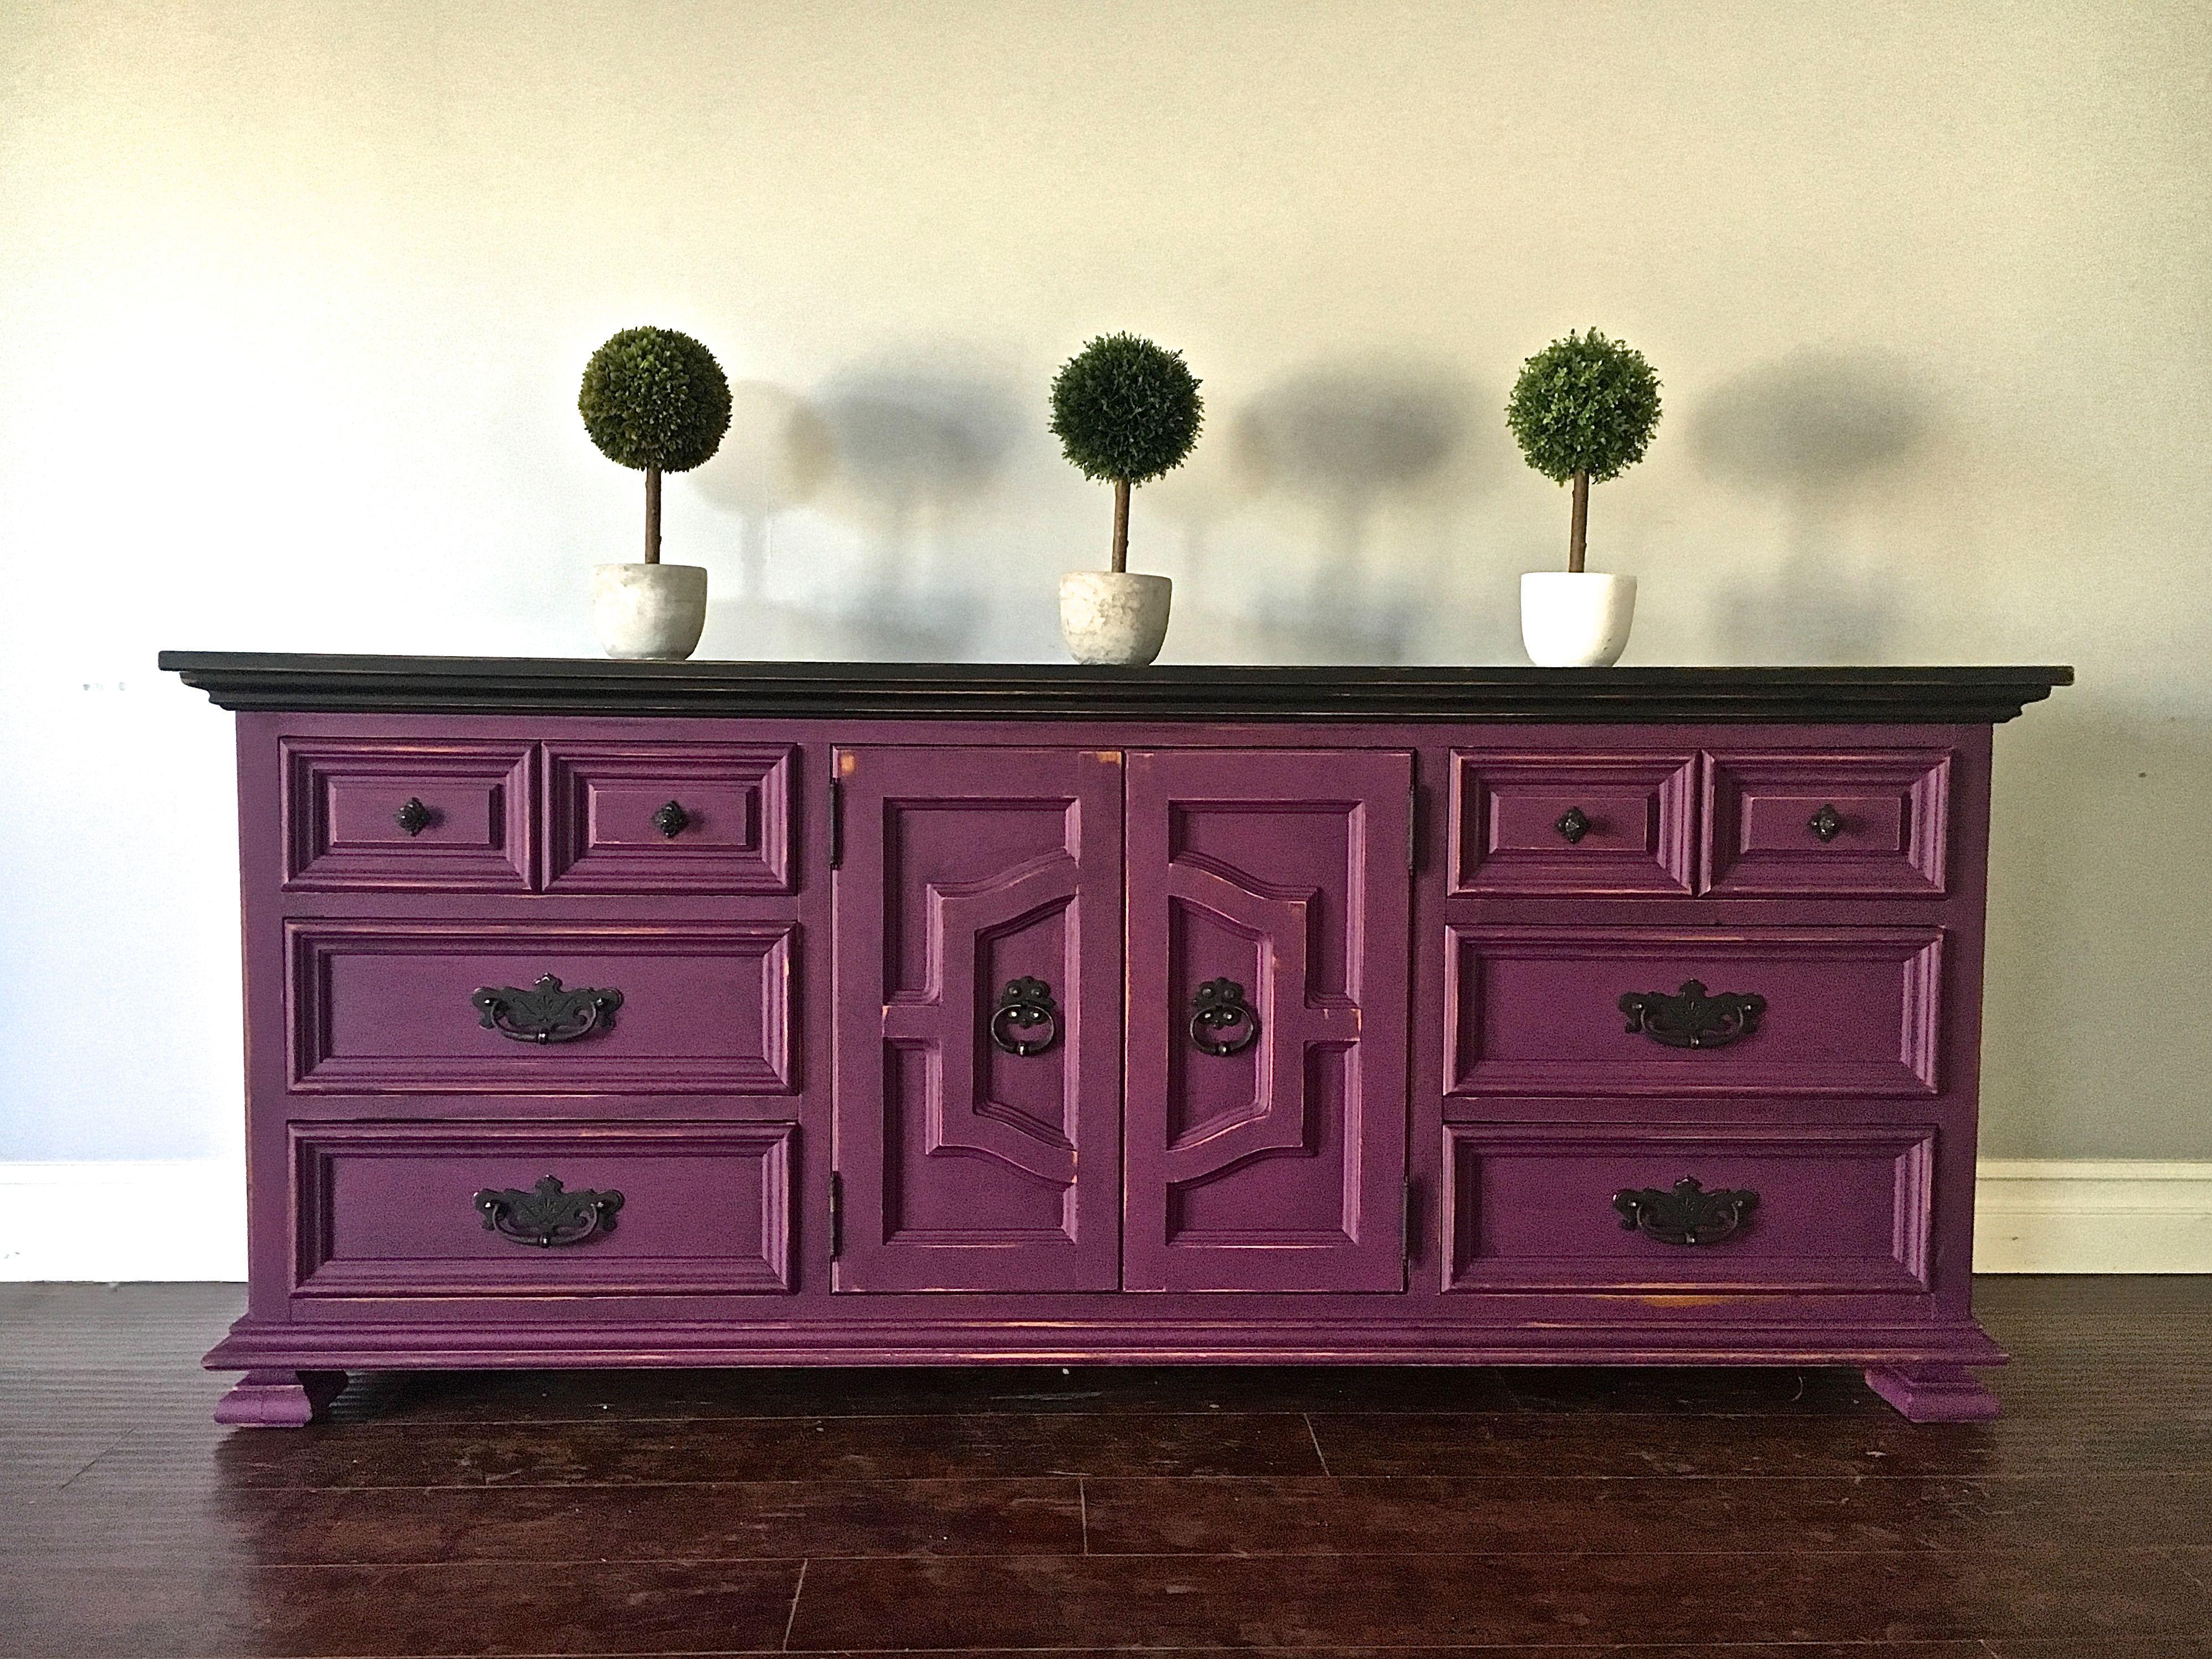 Black shabby chic furniture - Shabby Chic Plum Black 9 Drawer Dresser Sideboard 450 Sold